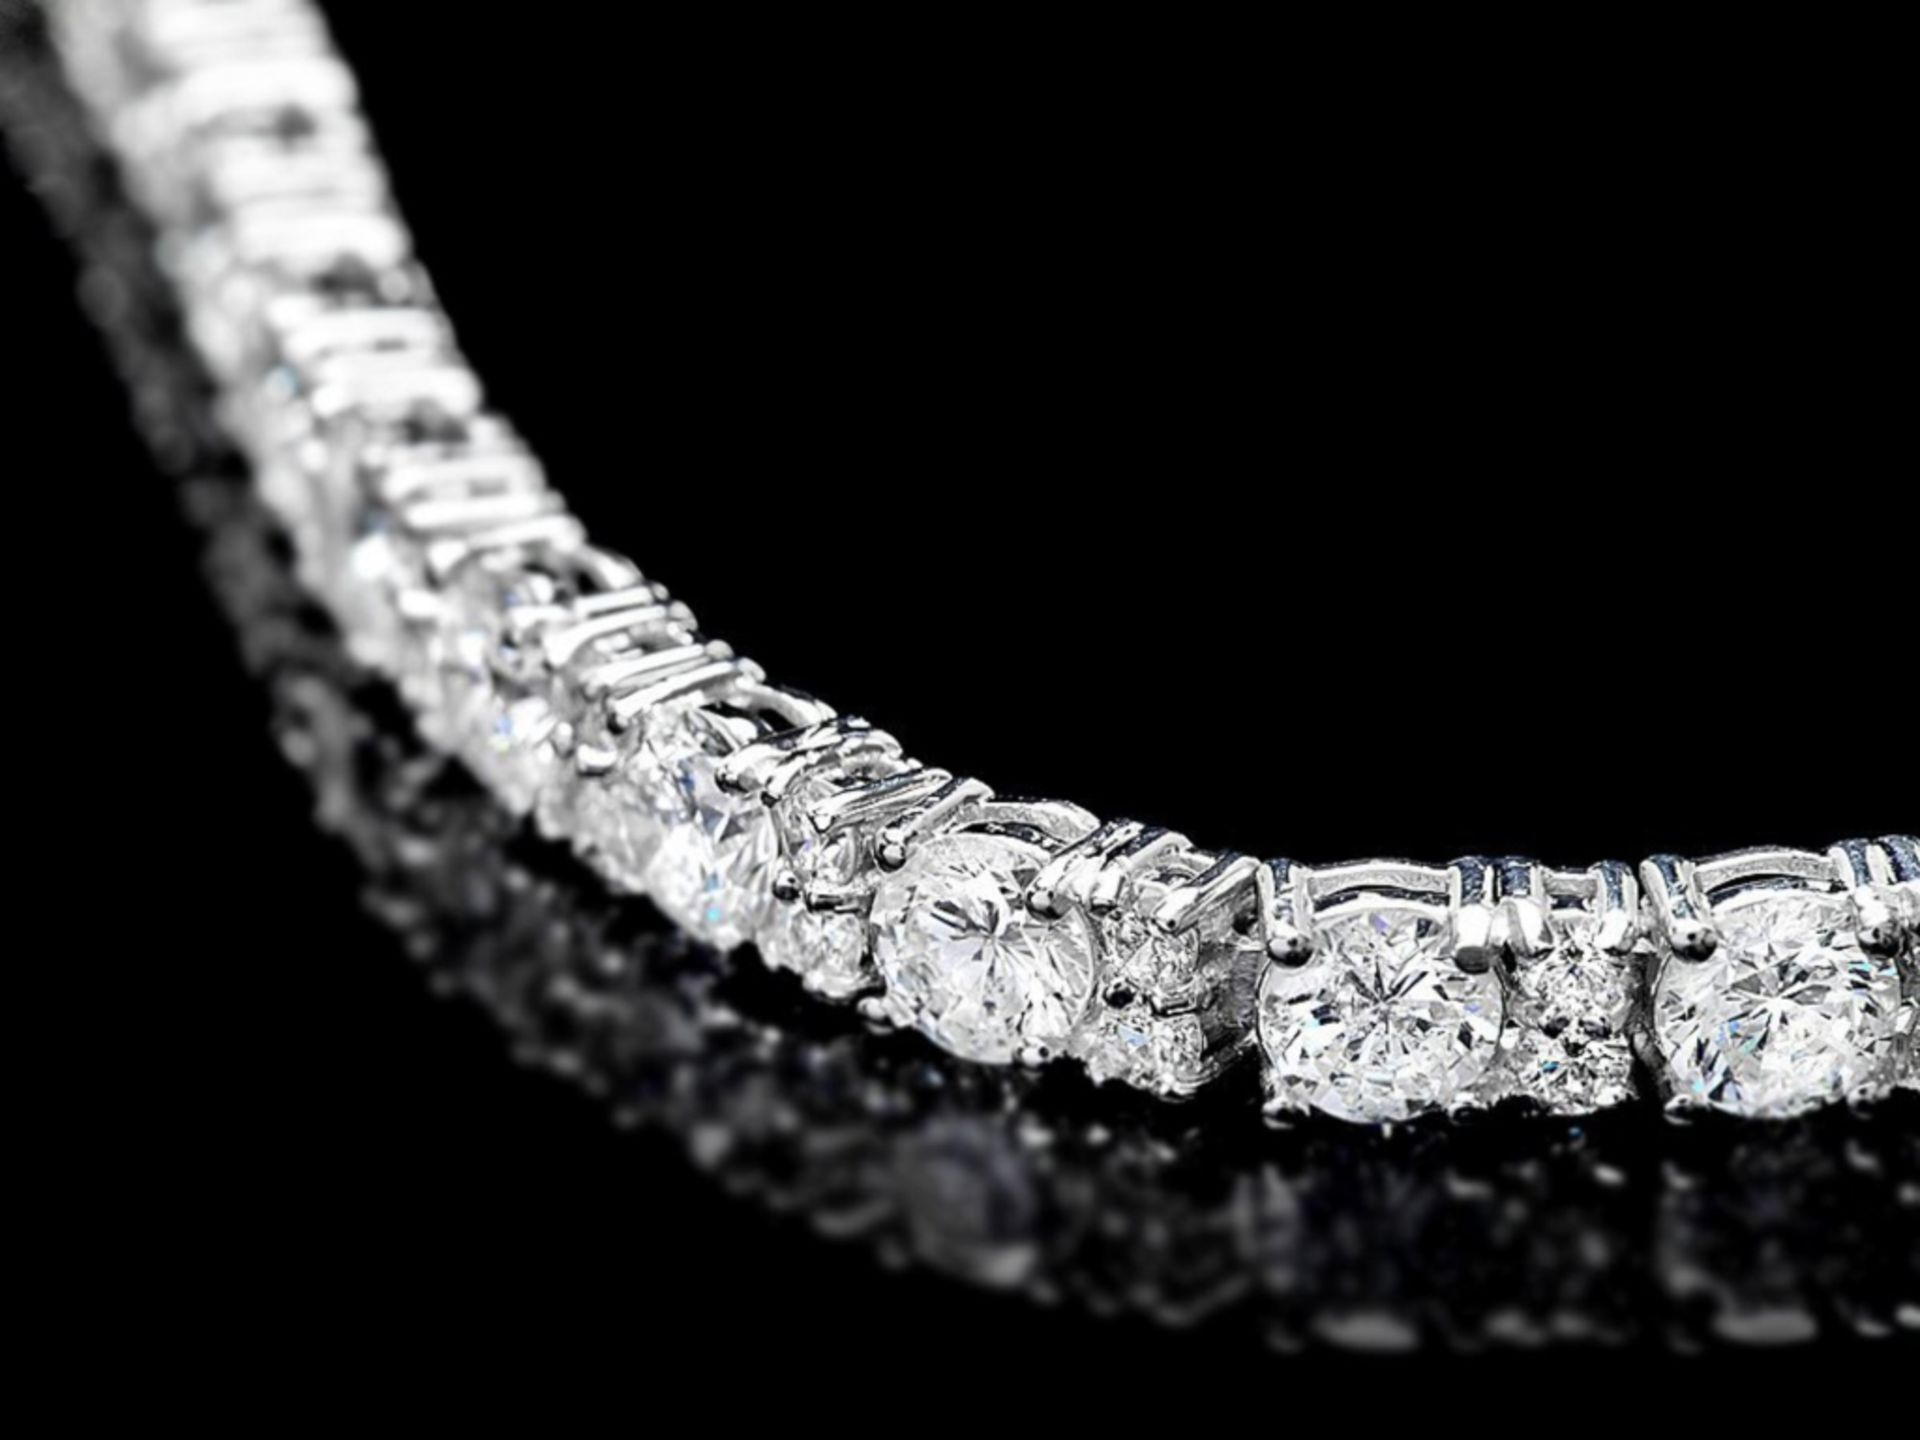 ^18k White Gold 9.00ct Diamond Bracelet - Image 2 of 4